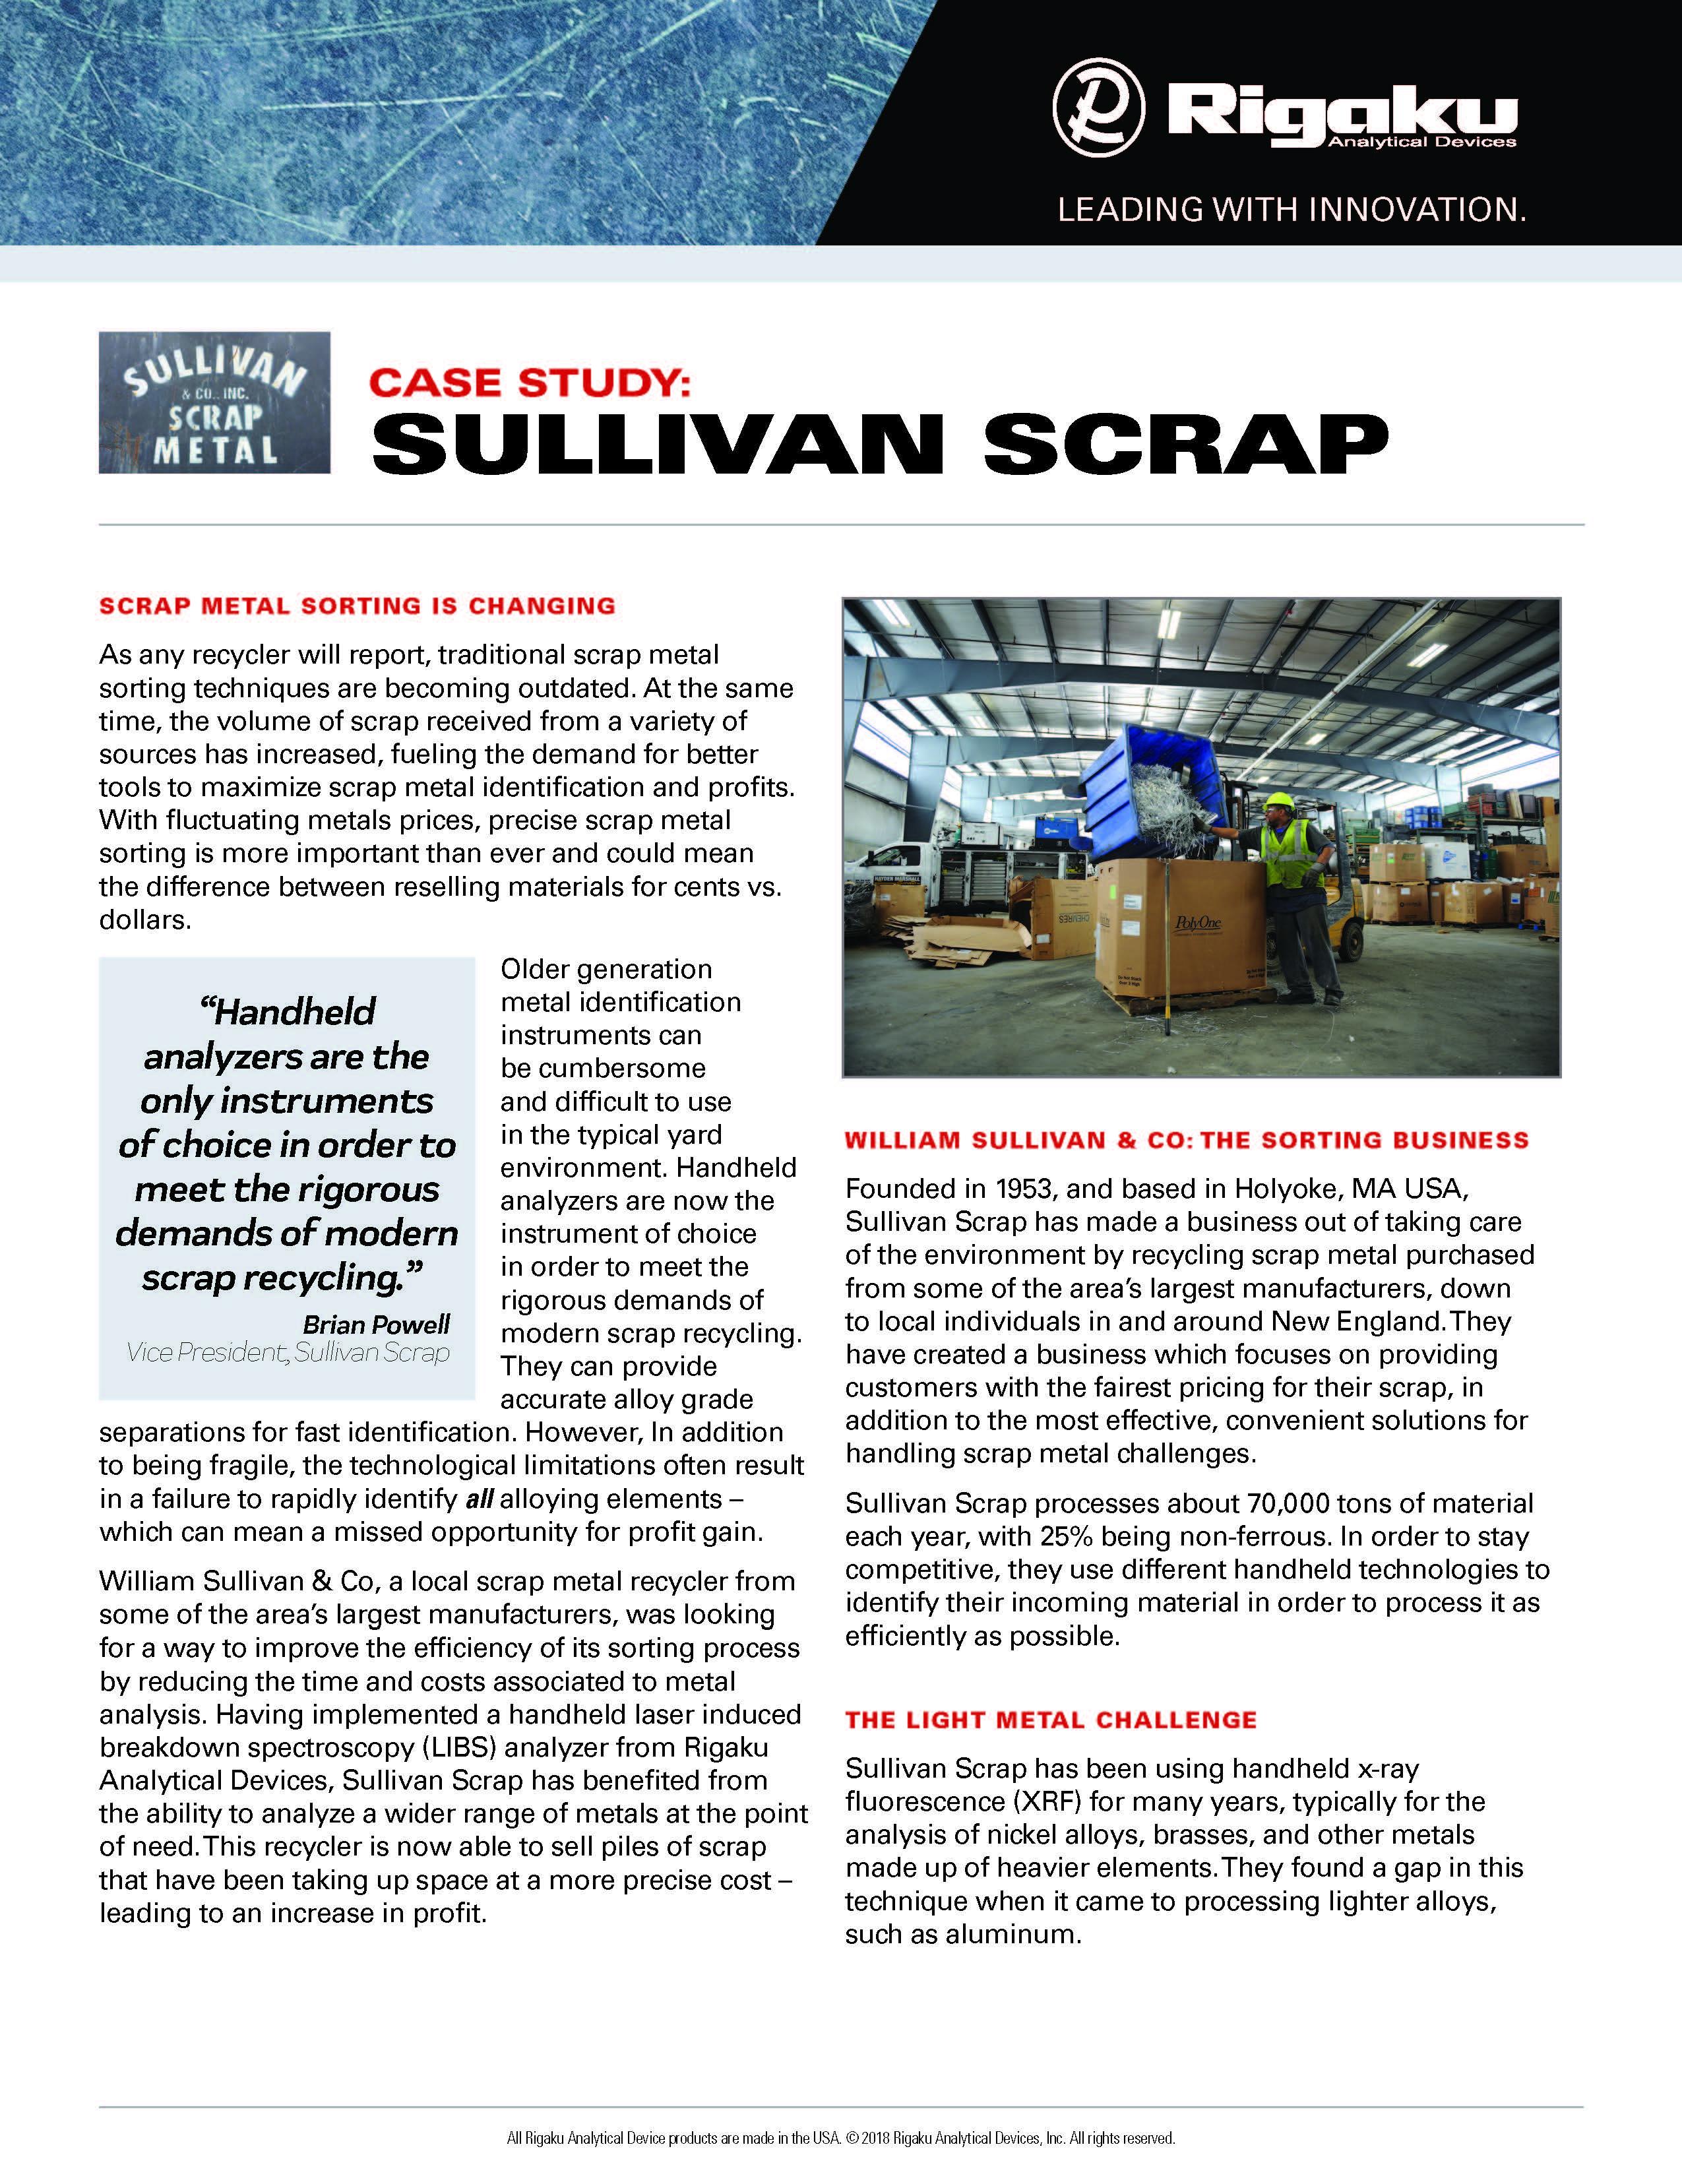 Sullivan Scrap Case Study 2018Jan11_Page_1